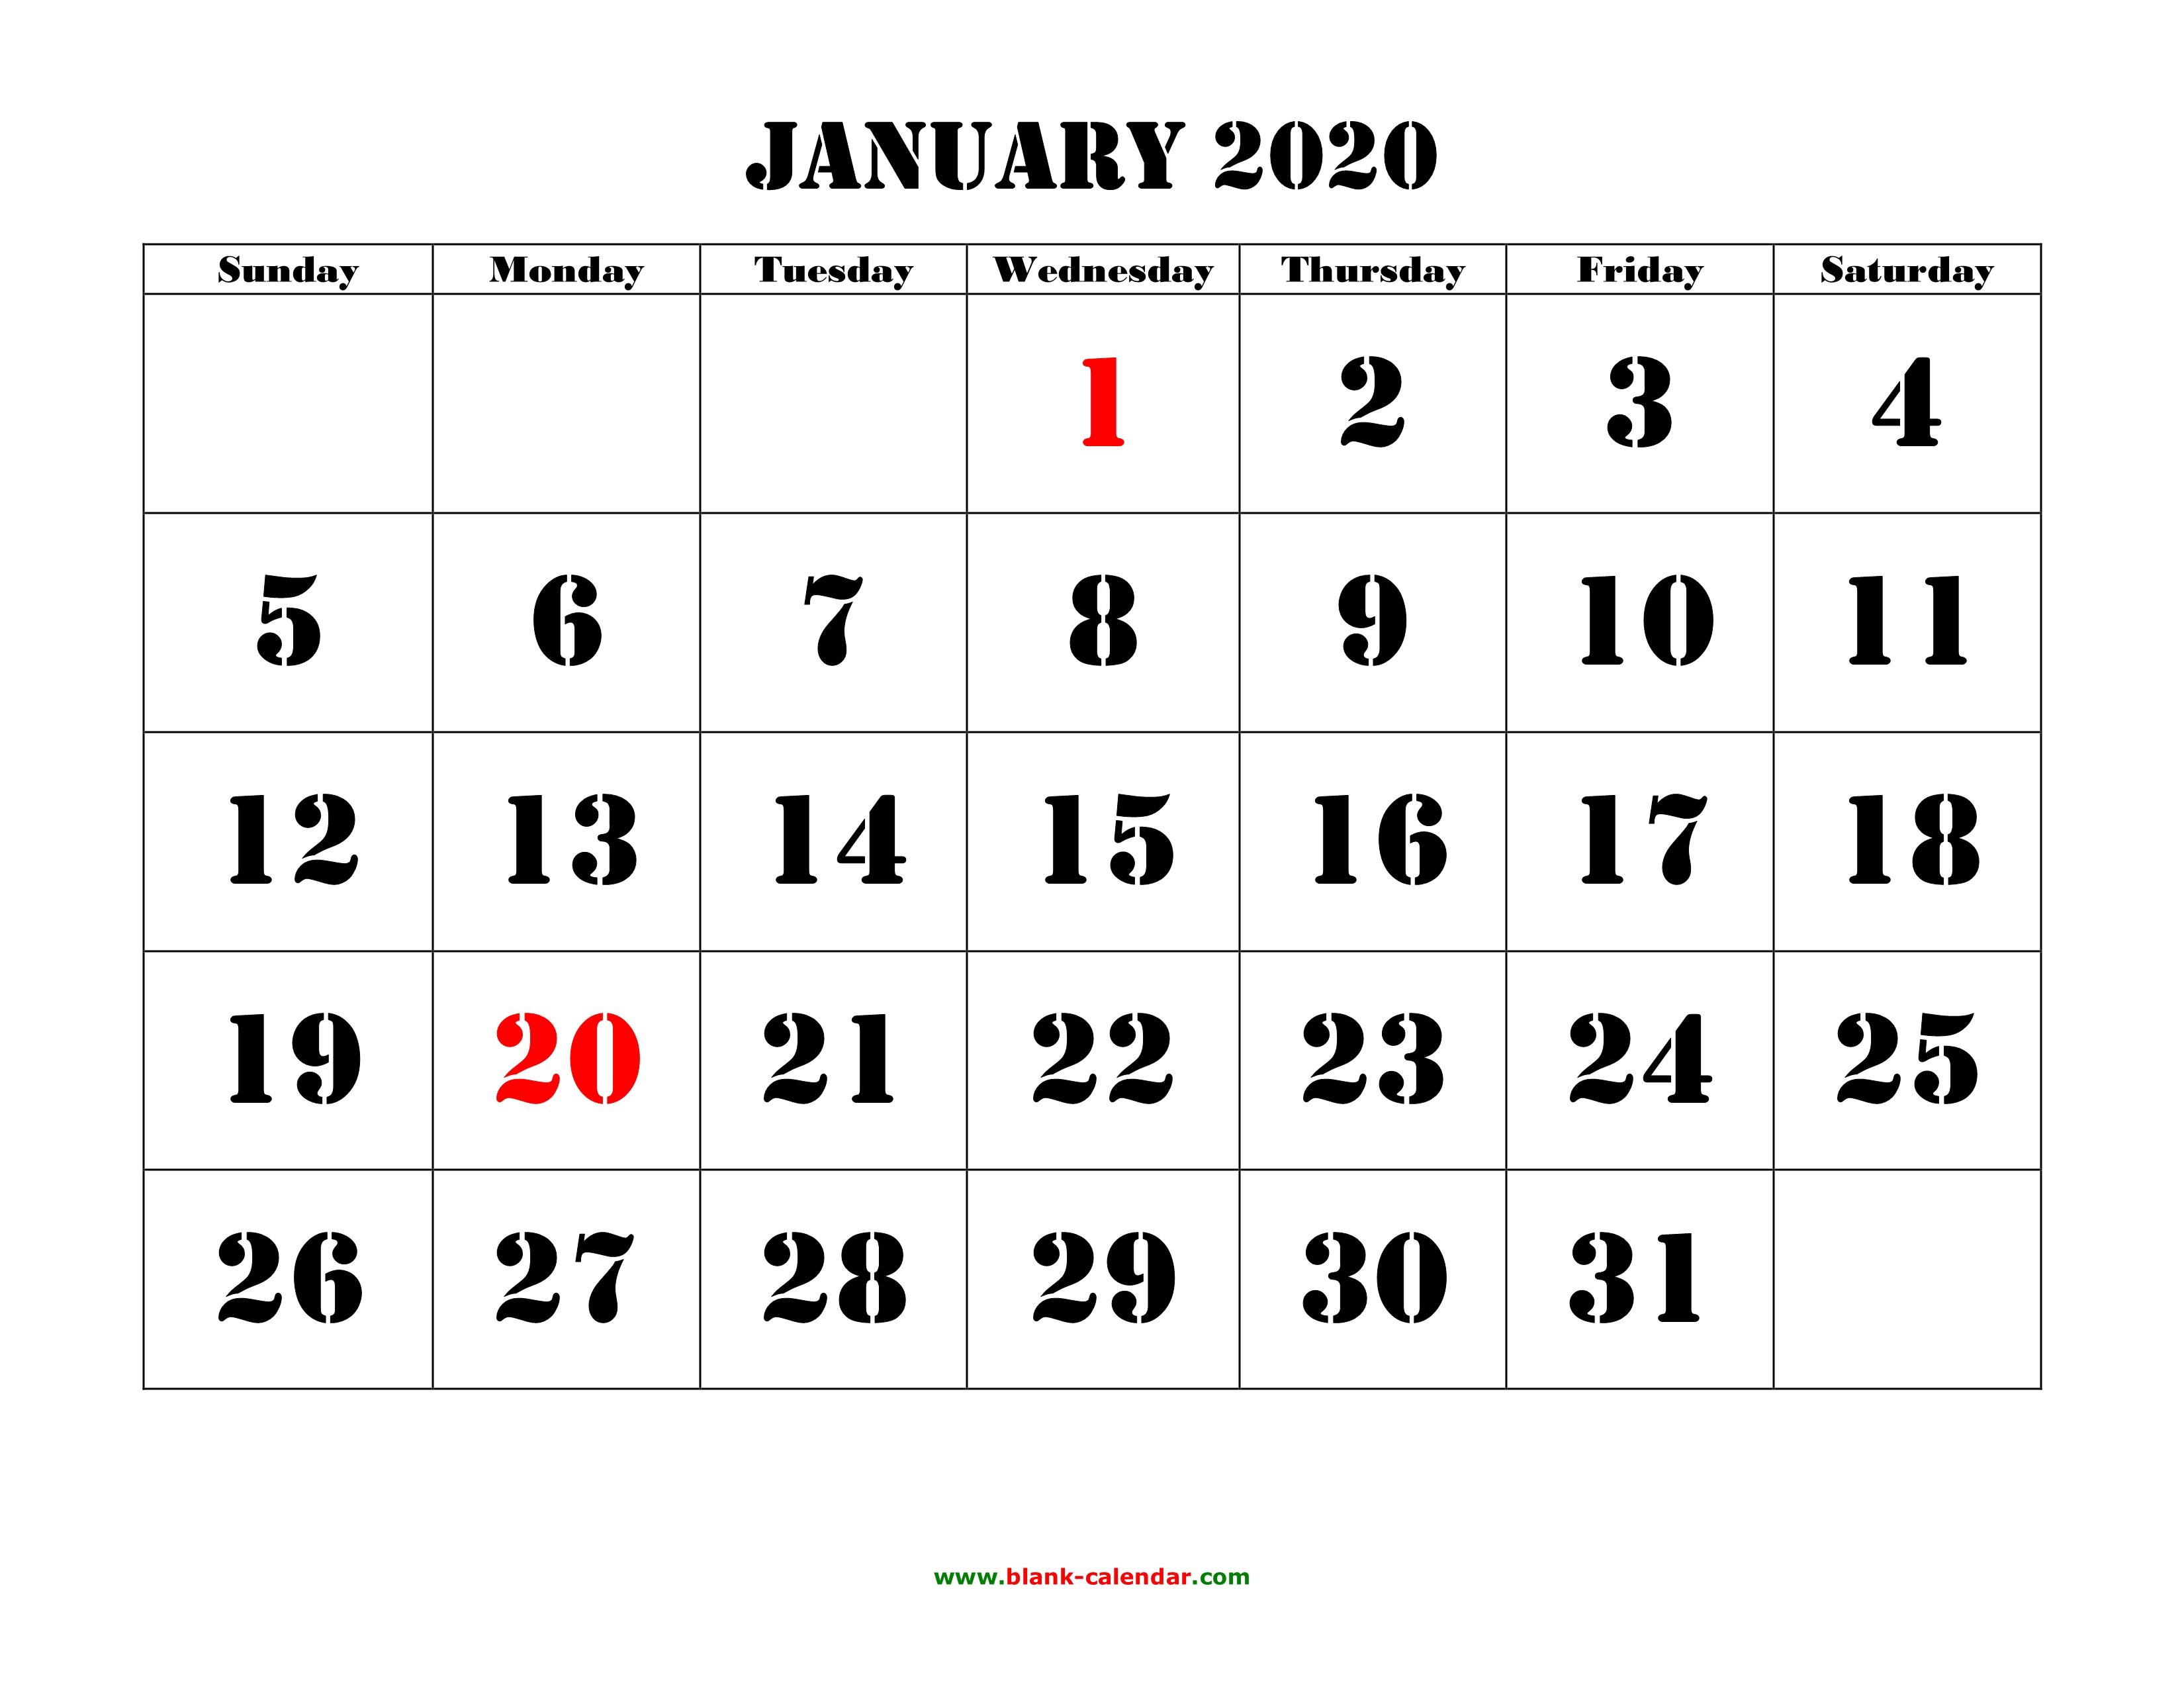 Free Download Printable Calendar 2020, Large Font Design , Holidays intended for Large Print 2020 Calendar To Print Free